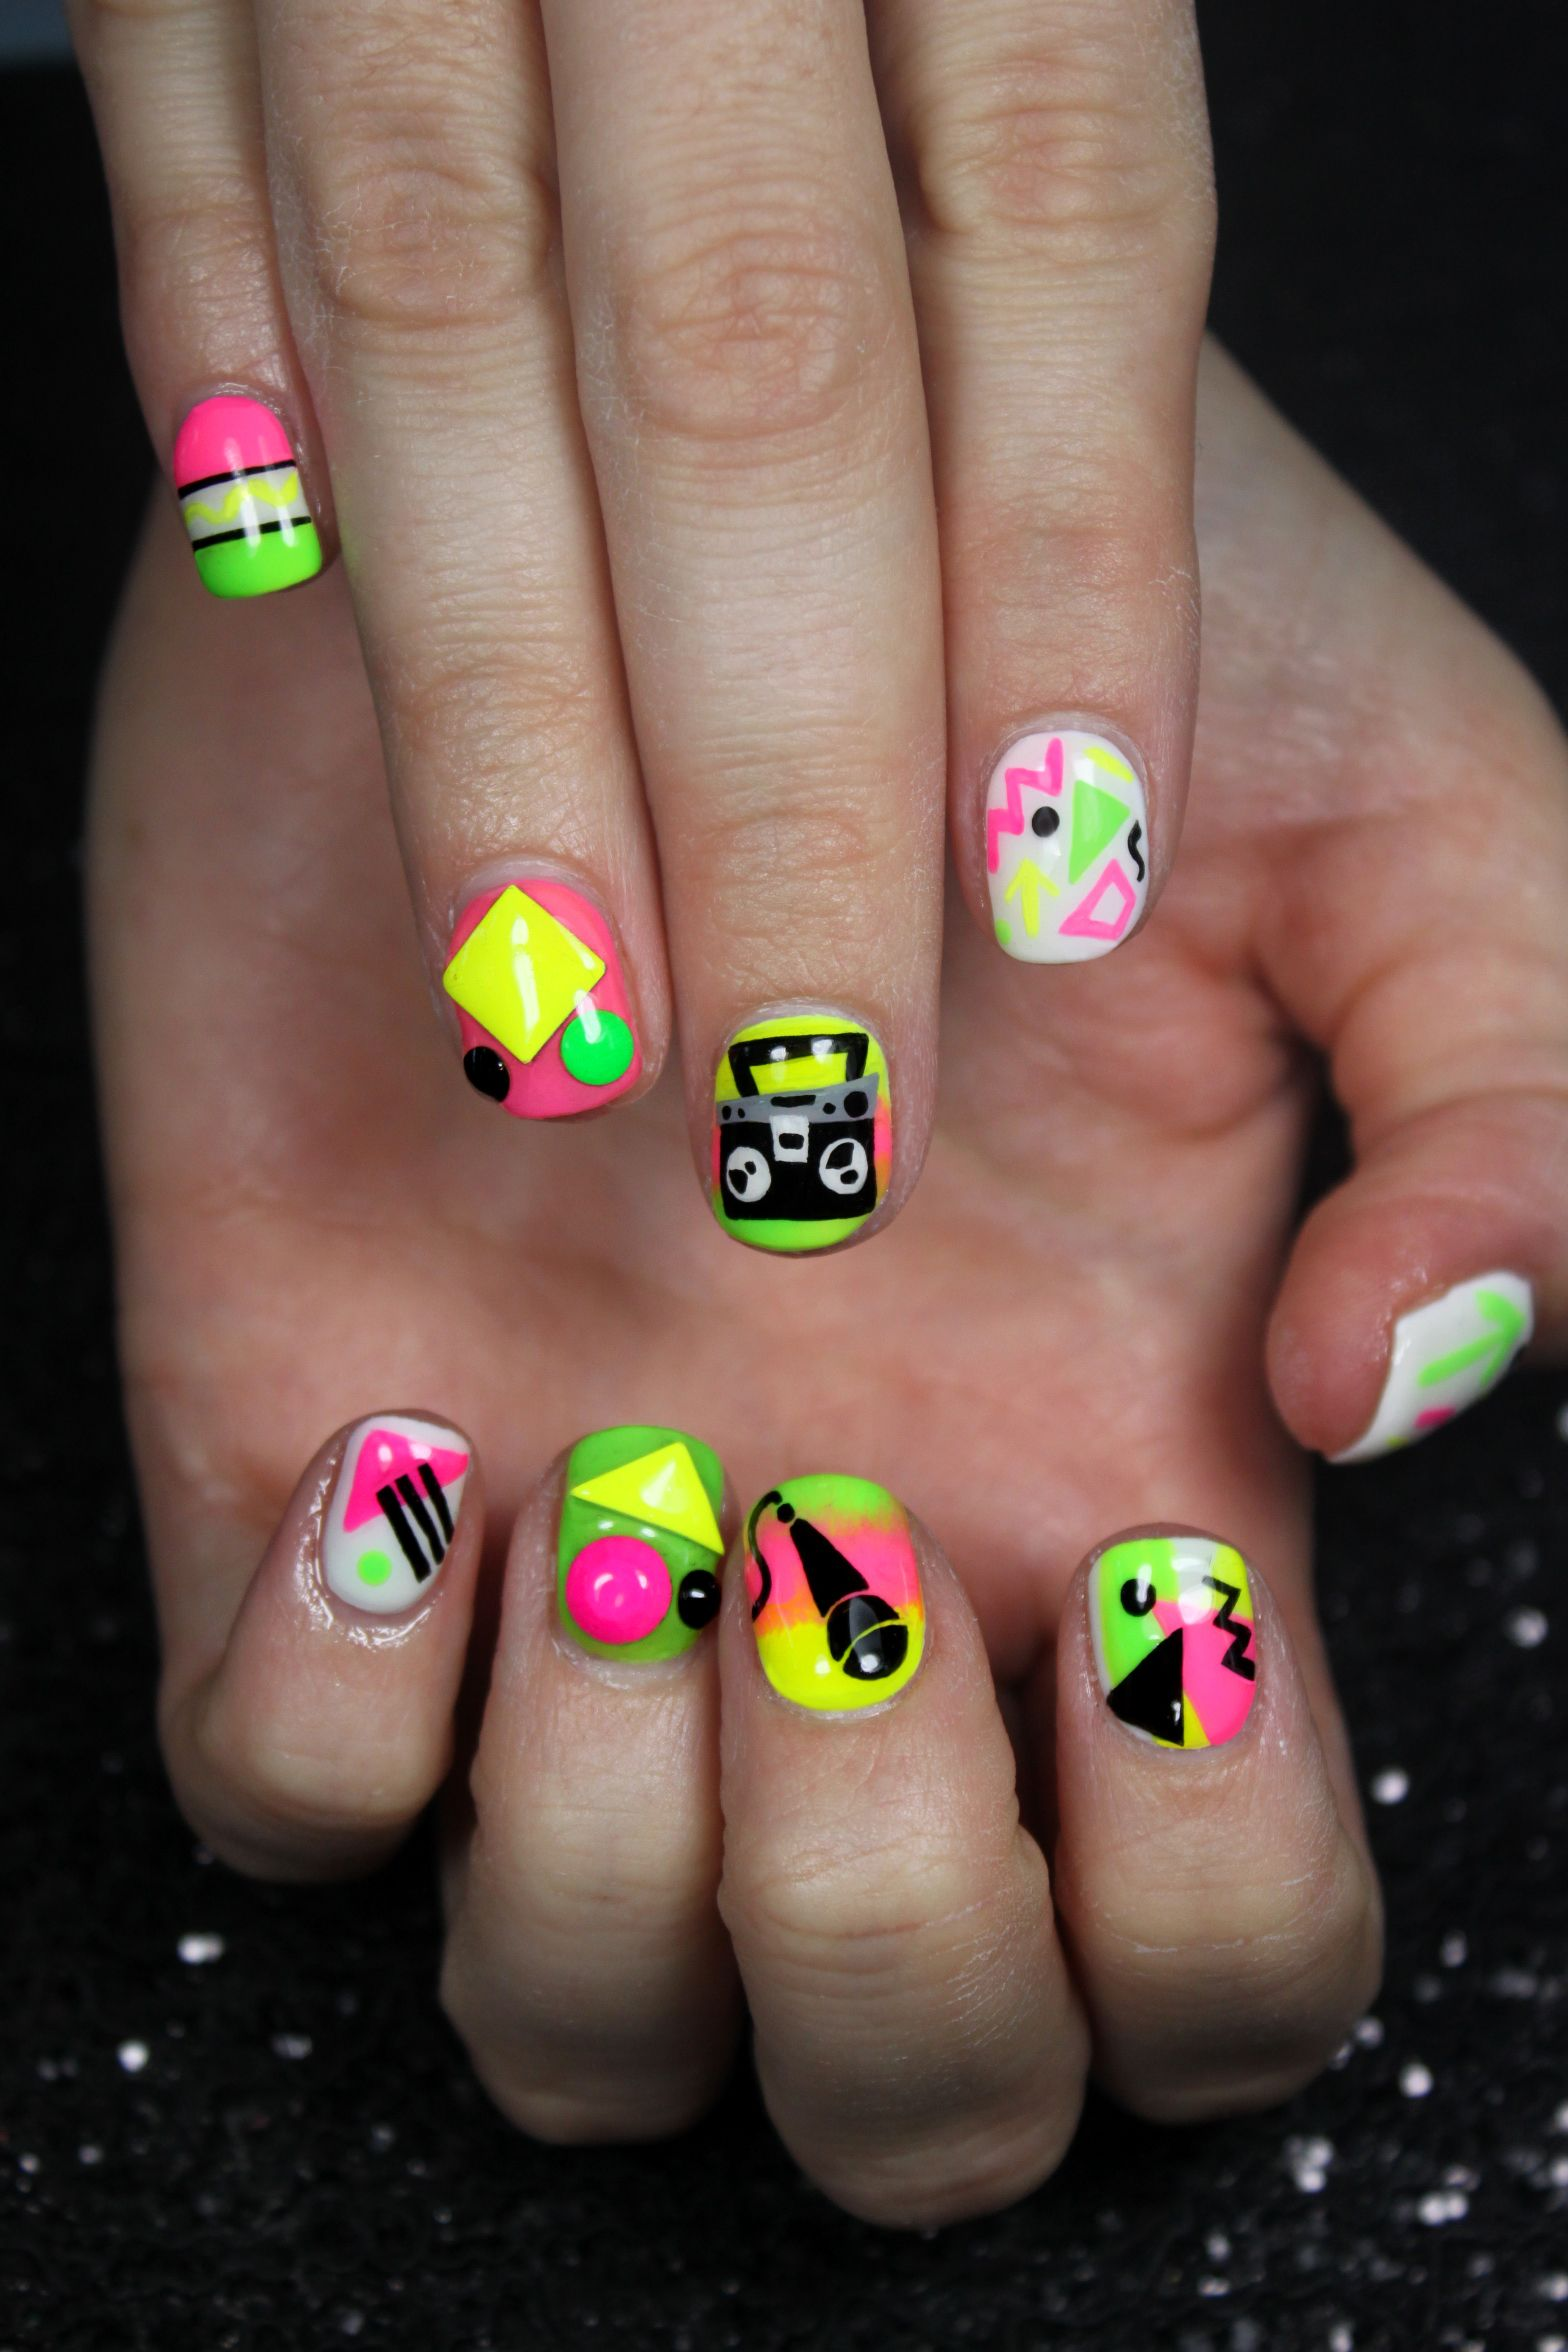 Lexi Neon Nail Art By Nail Art Gallery Pinterest Top Nail